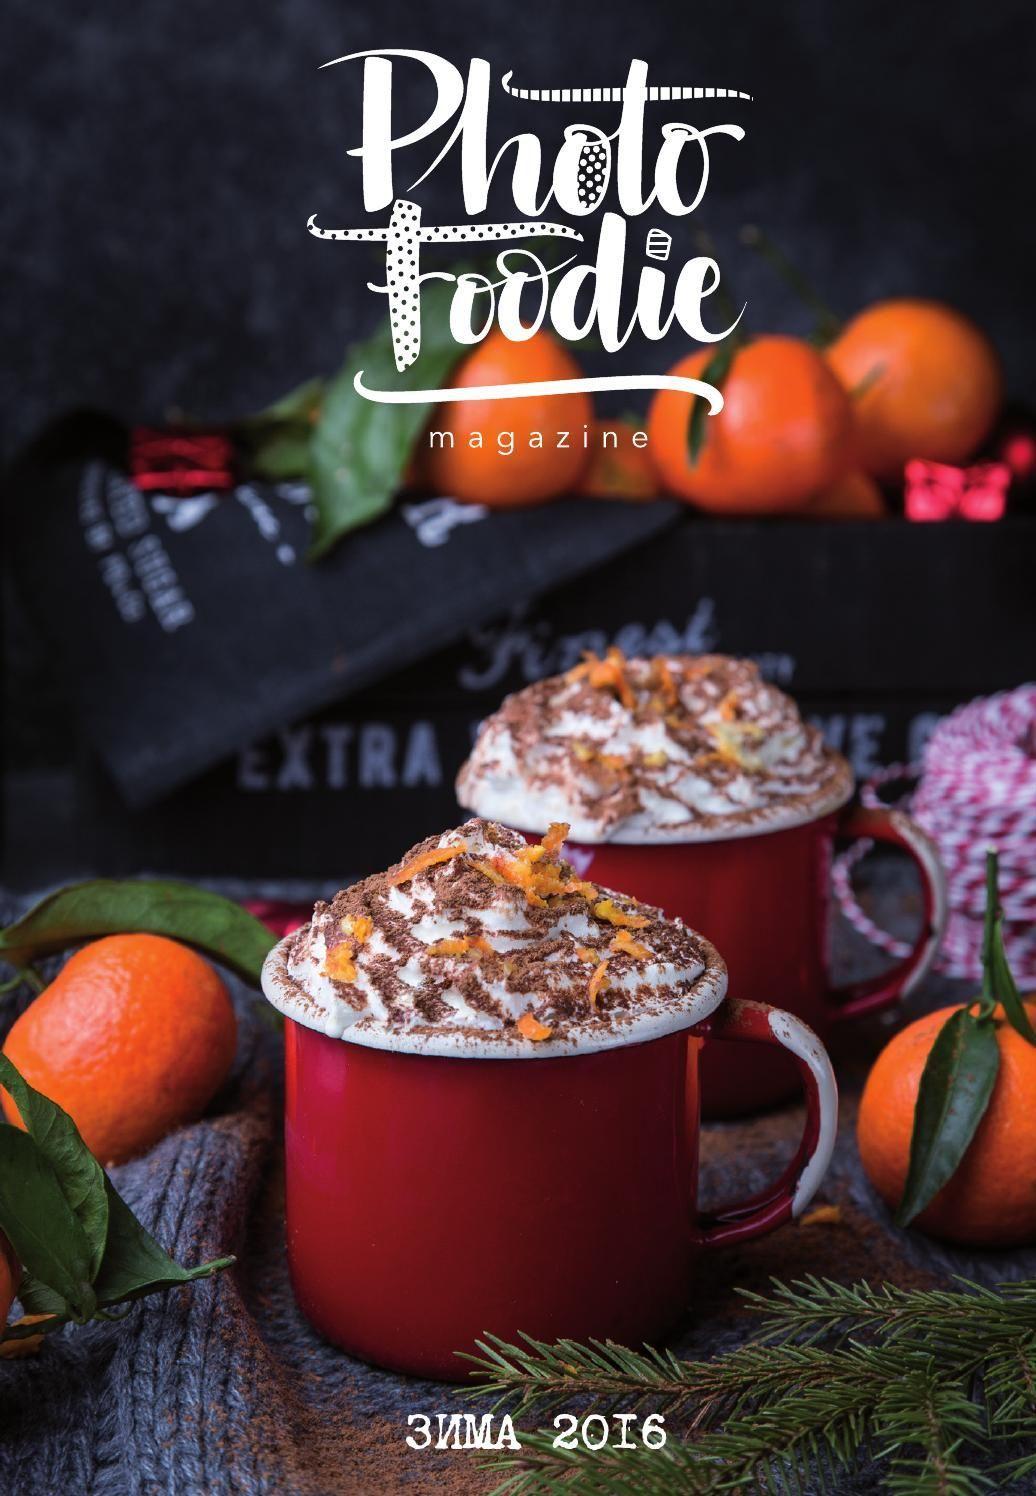 Photo Foodie Winter 2016 Food Magazine Foodie Cooking Magazines